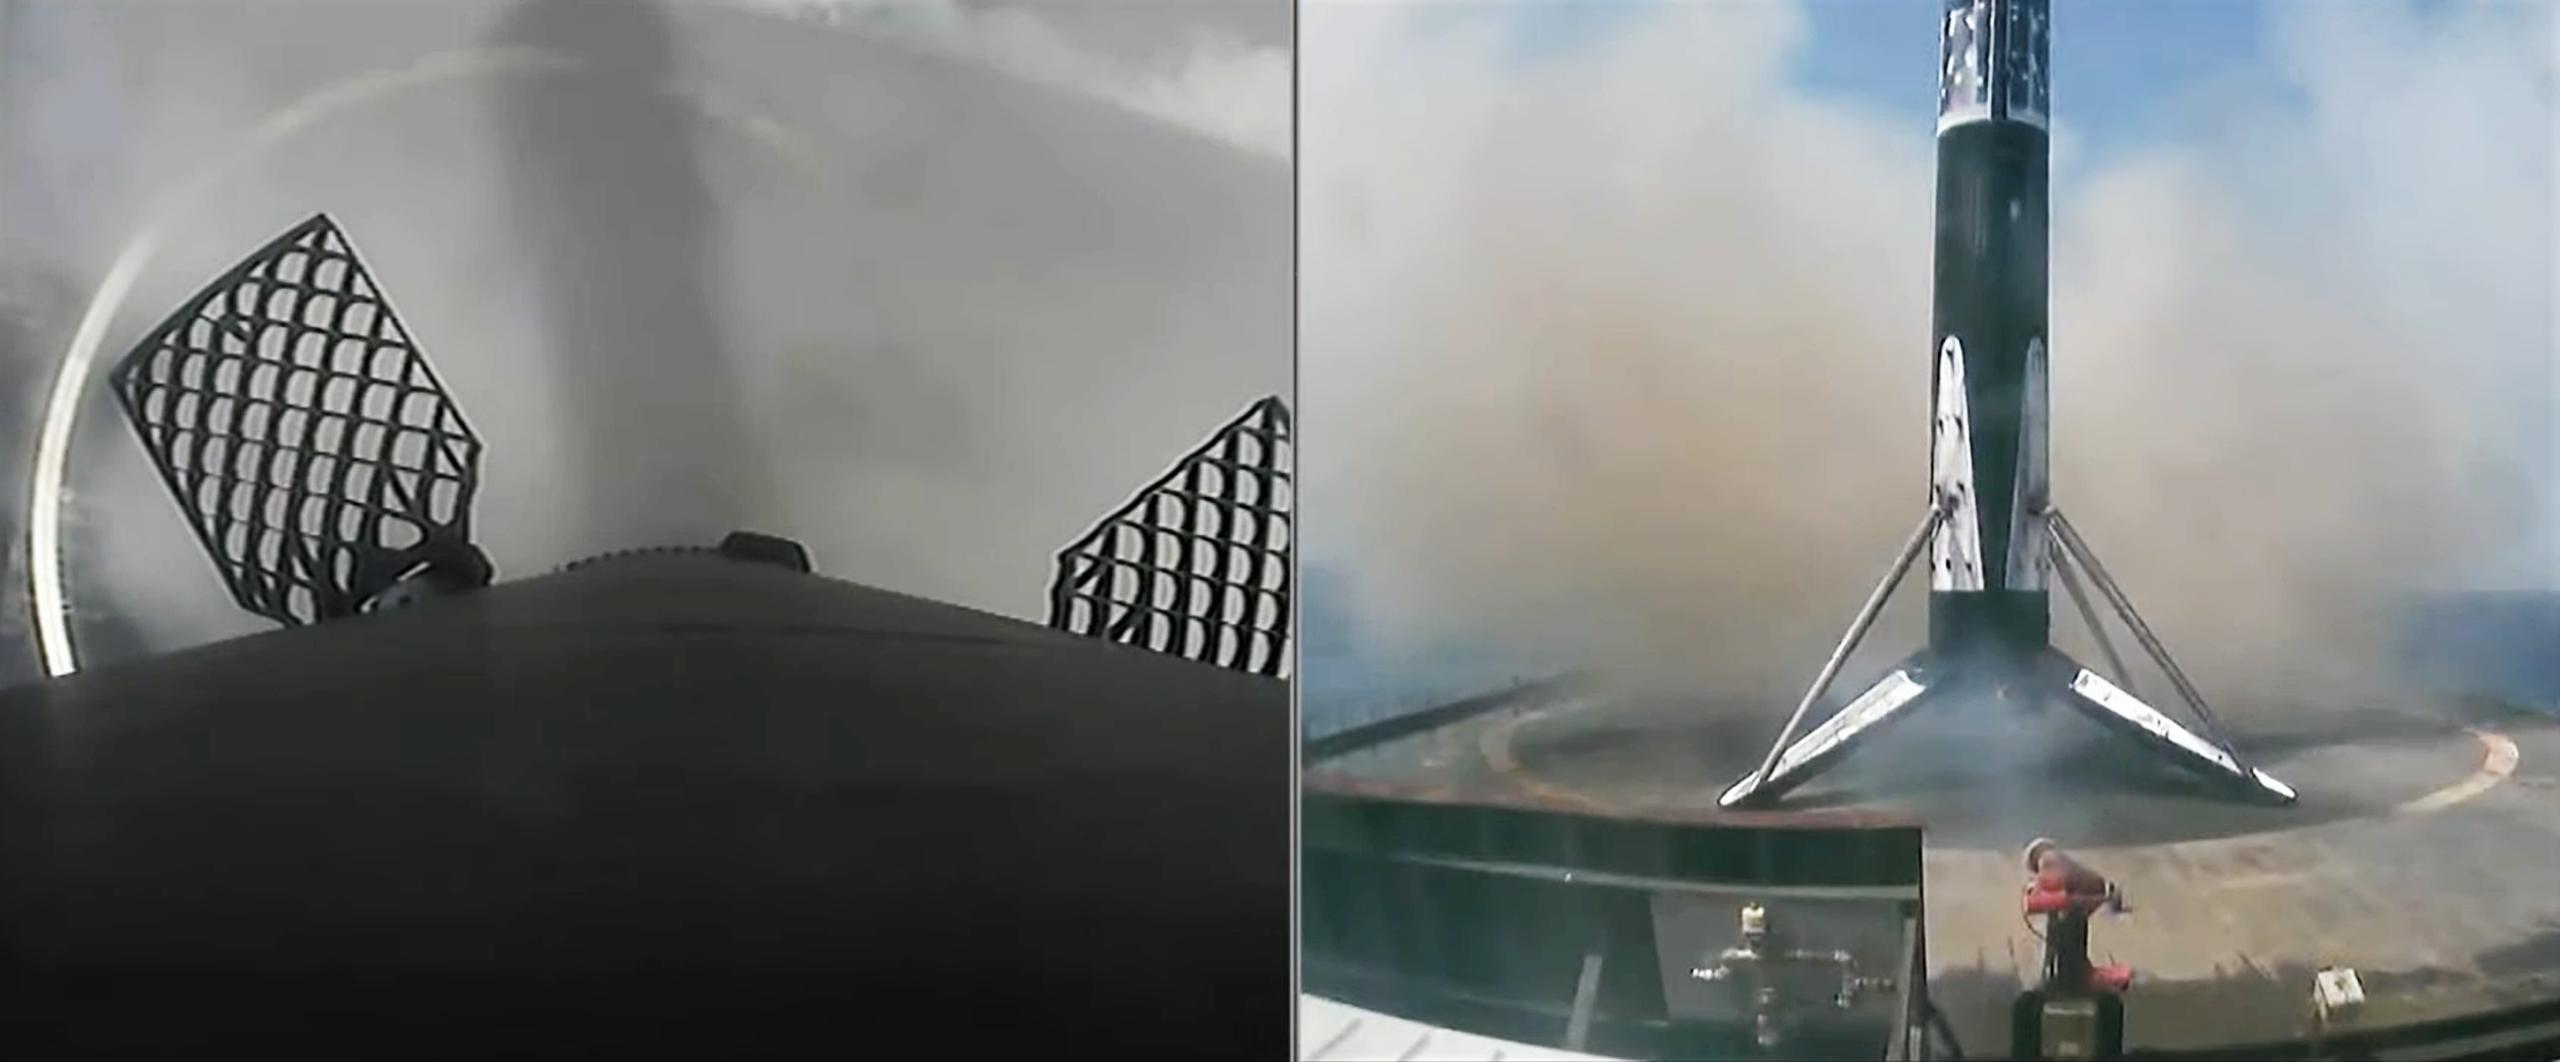 Starlink-23 Falcon 9 B1058 LC-40 040721 webcast (SpaceX) landing 1 crop (c)